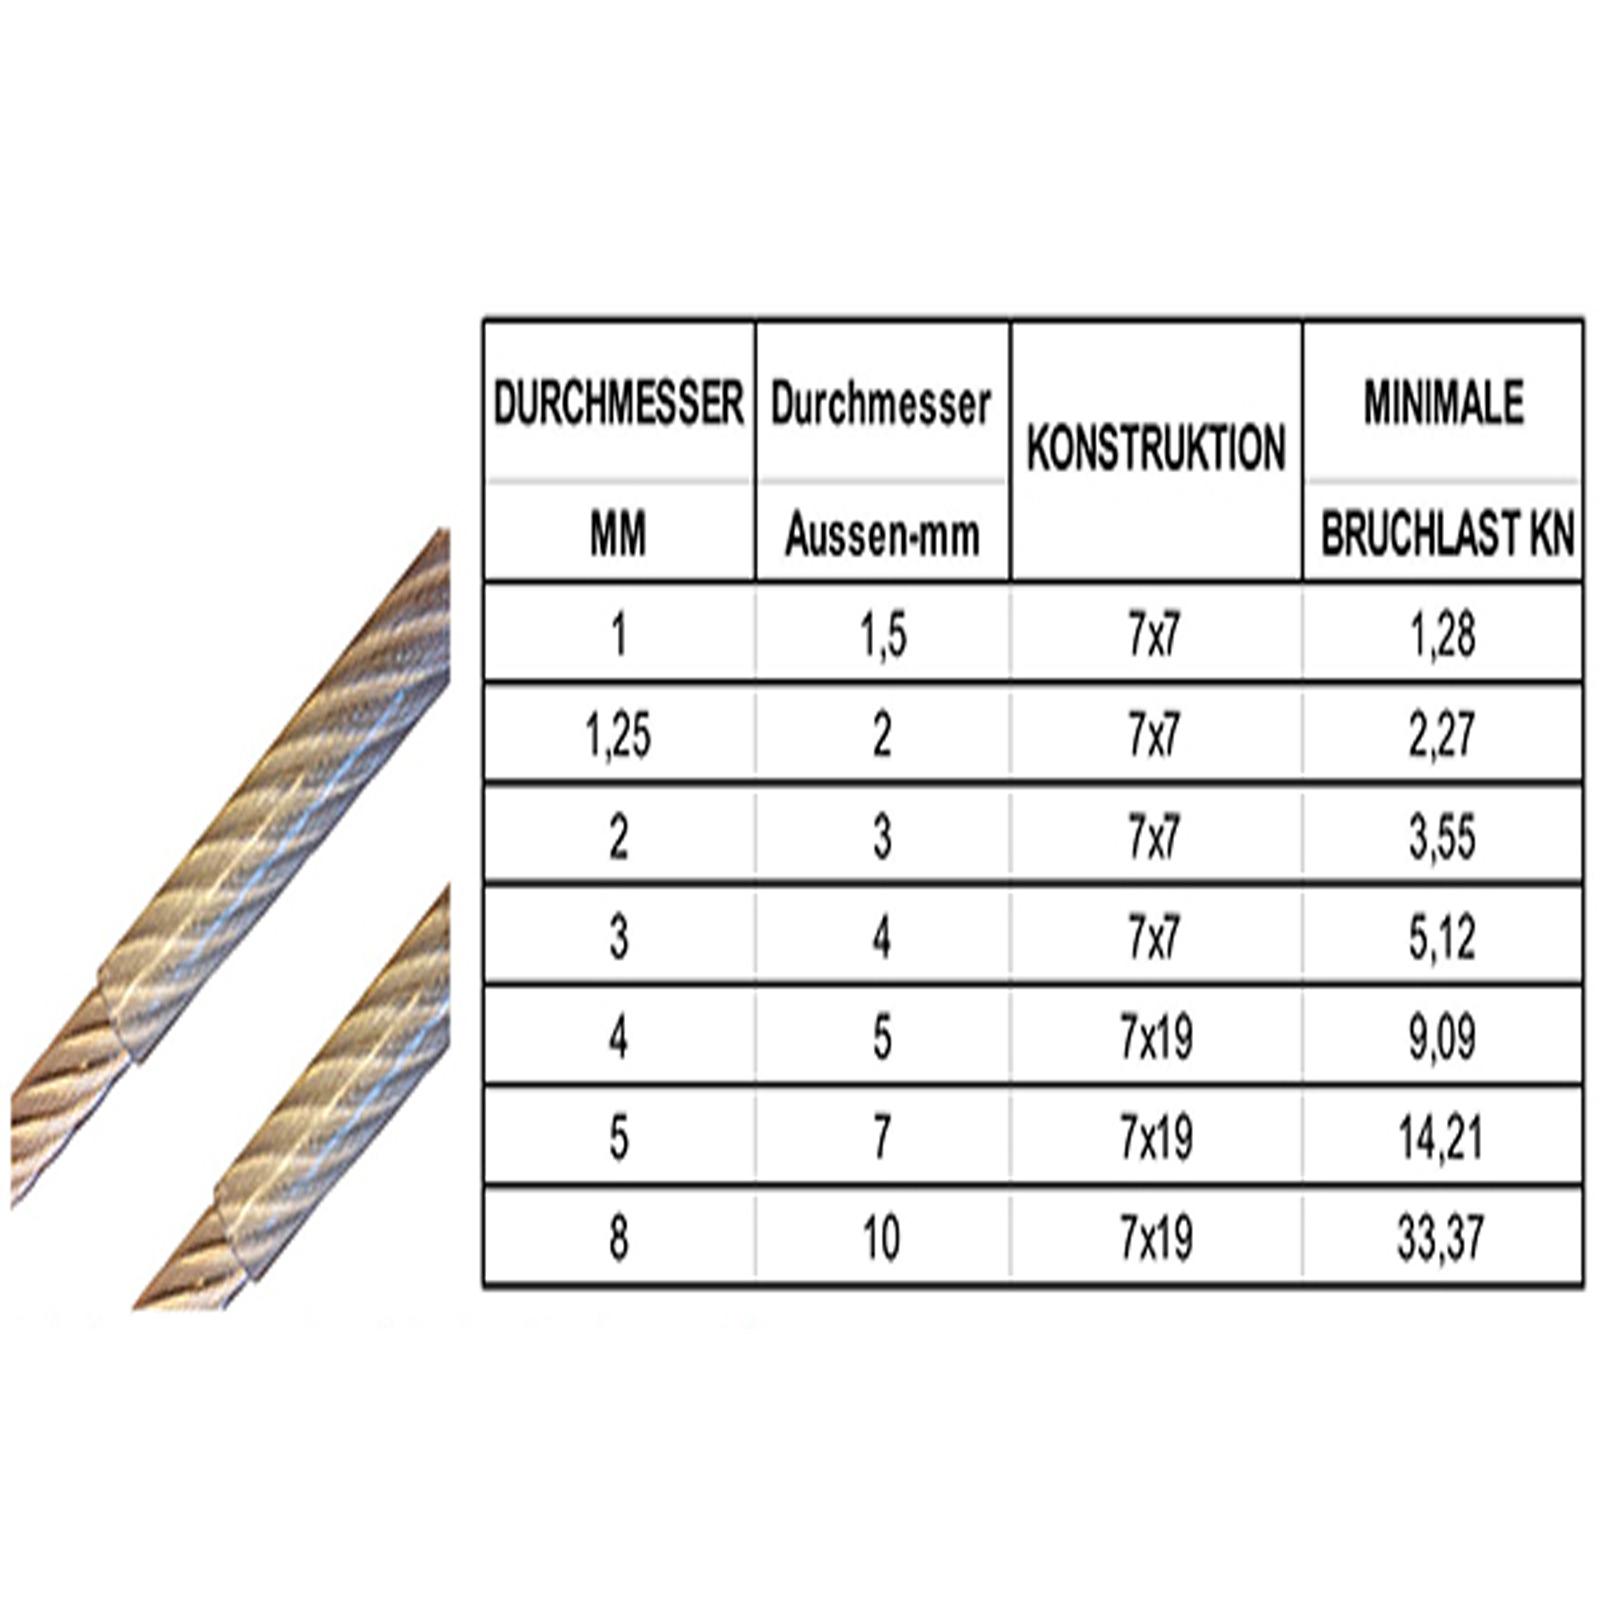 10m Edelstahldrahtseil, 1,0mm Drahtseil PVC-ummantelt, Konstruktion ...